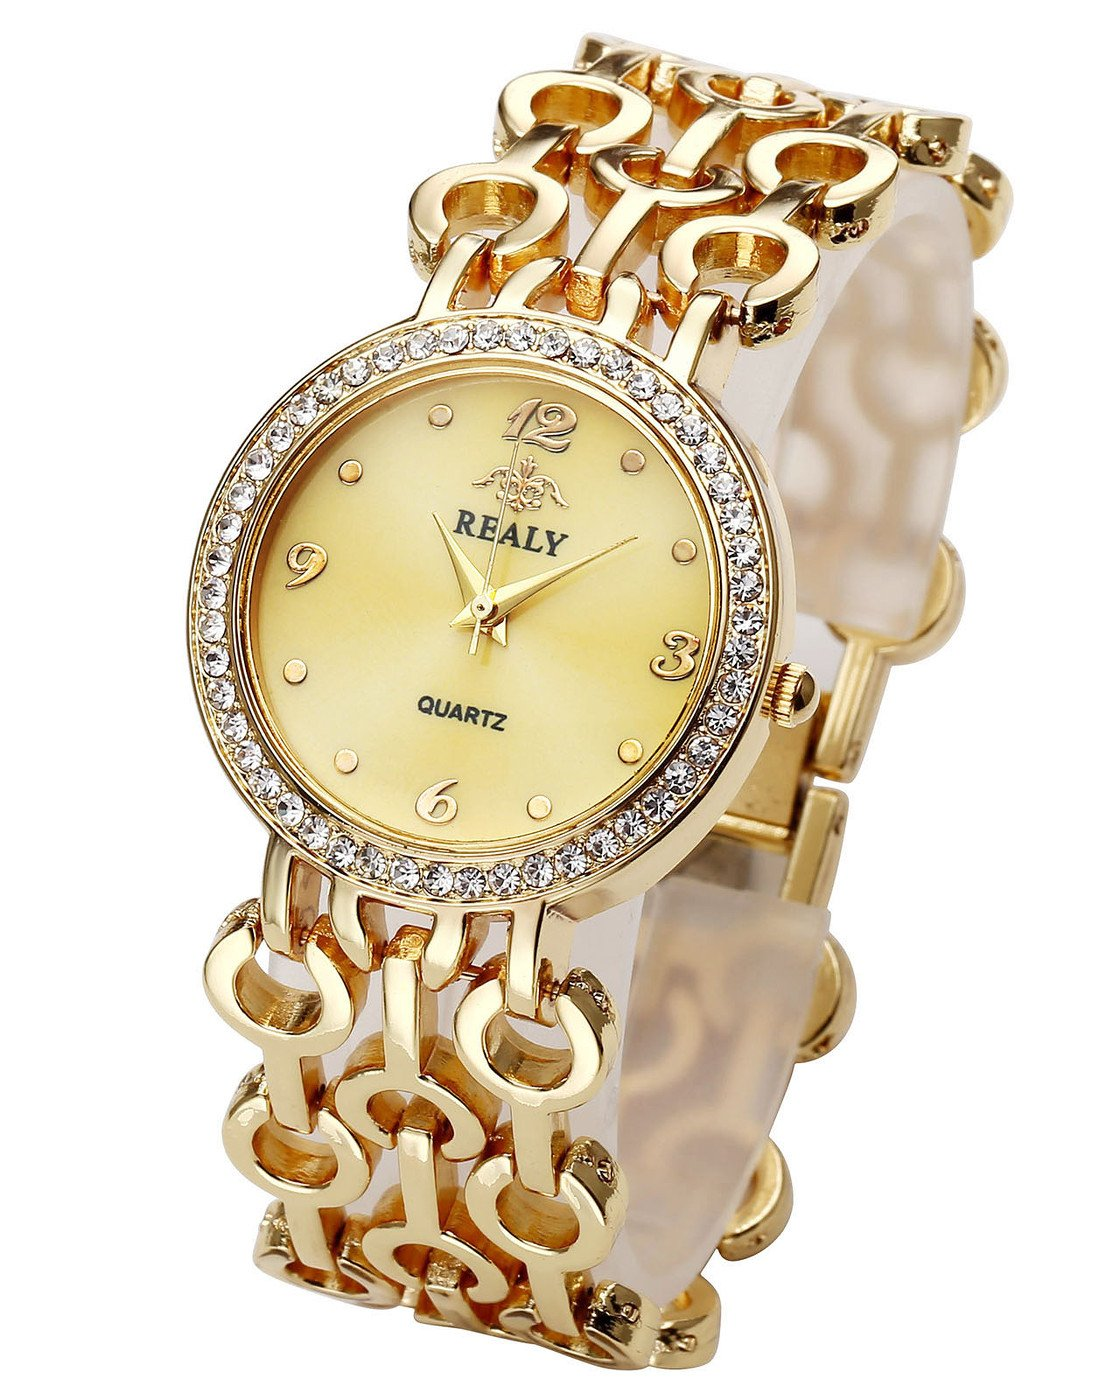 Top Plaza Women Elegant Fashion Bracelet Analog Quartz Watch Gold Tone Rhinestone Case Big Face Large Dial Wide Band Waterproof Cuff Watch